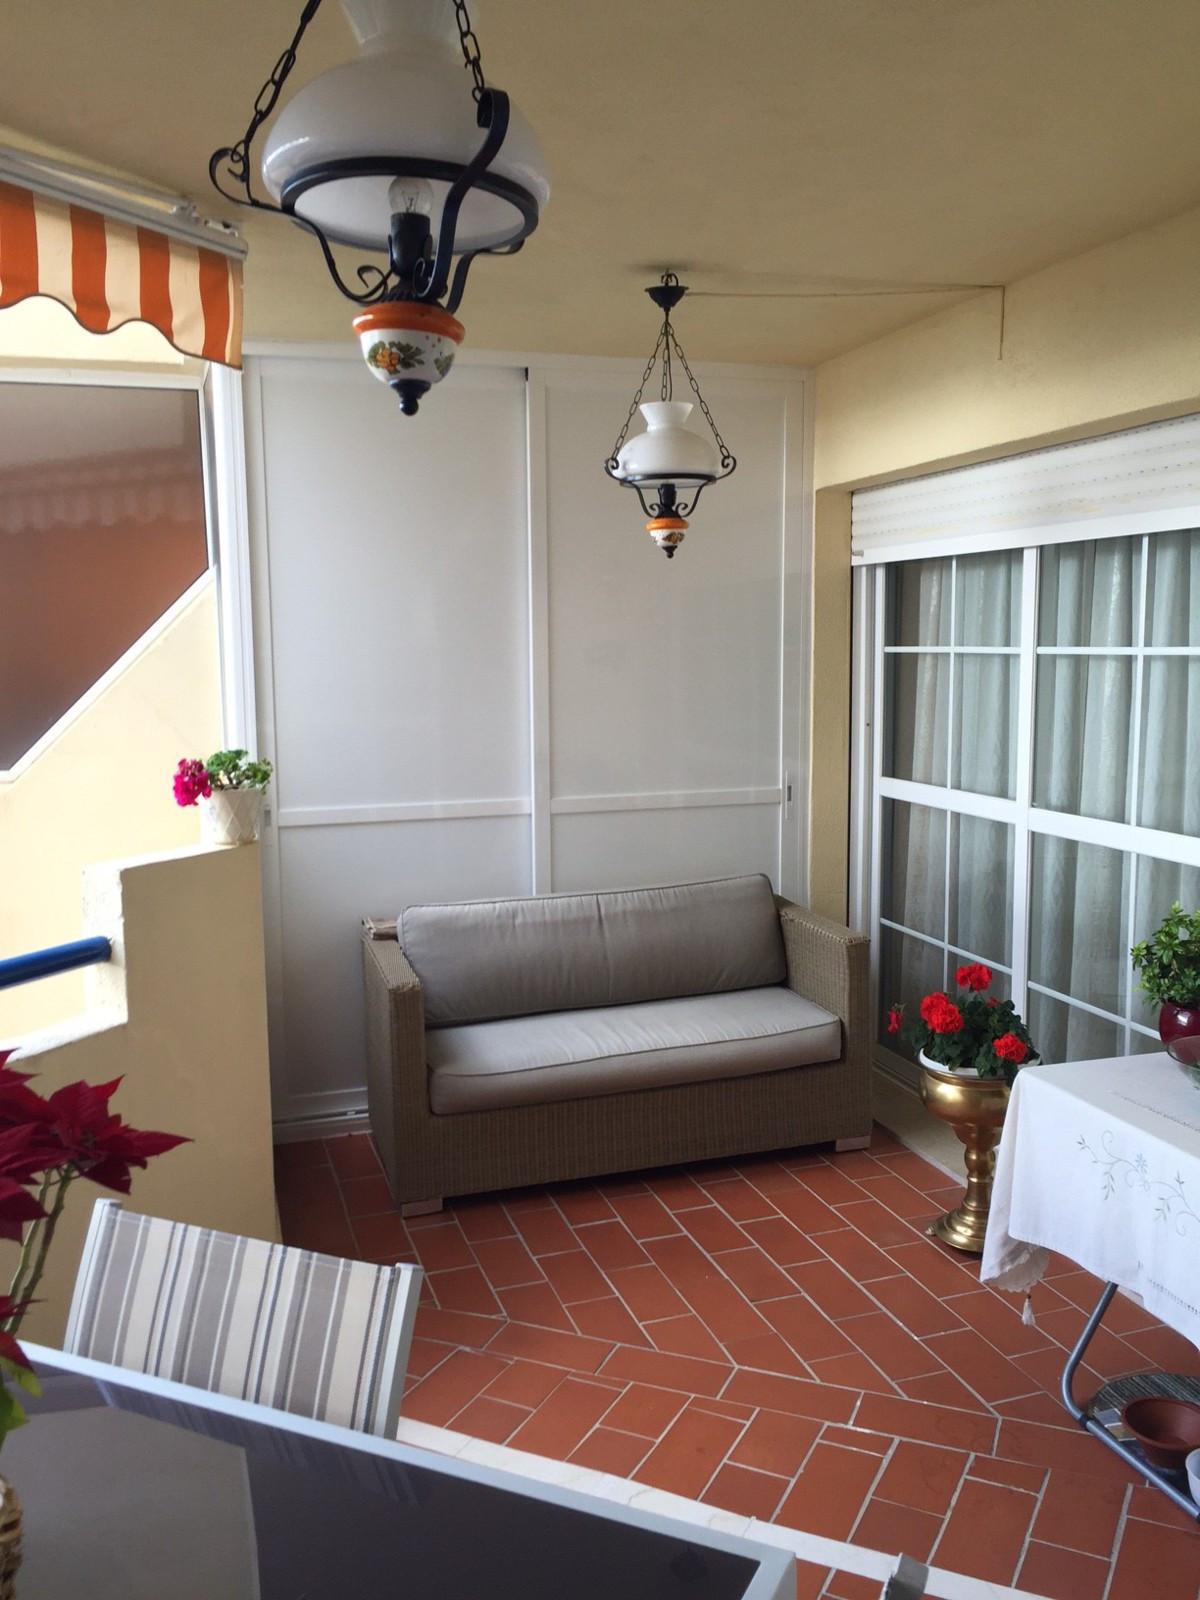 Great apartment in Monte Biarritz Urbanization in Estepona, has three bedroom and three bathroom wit,Spain